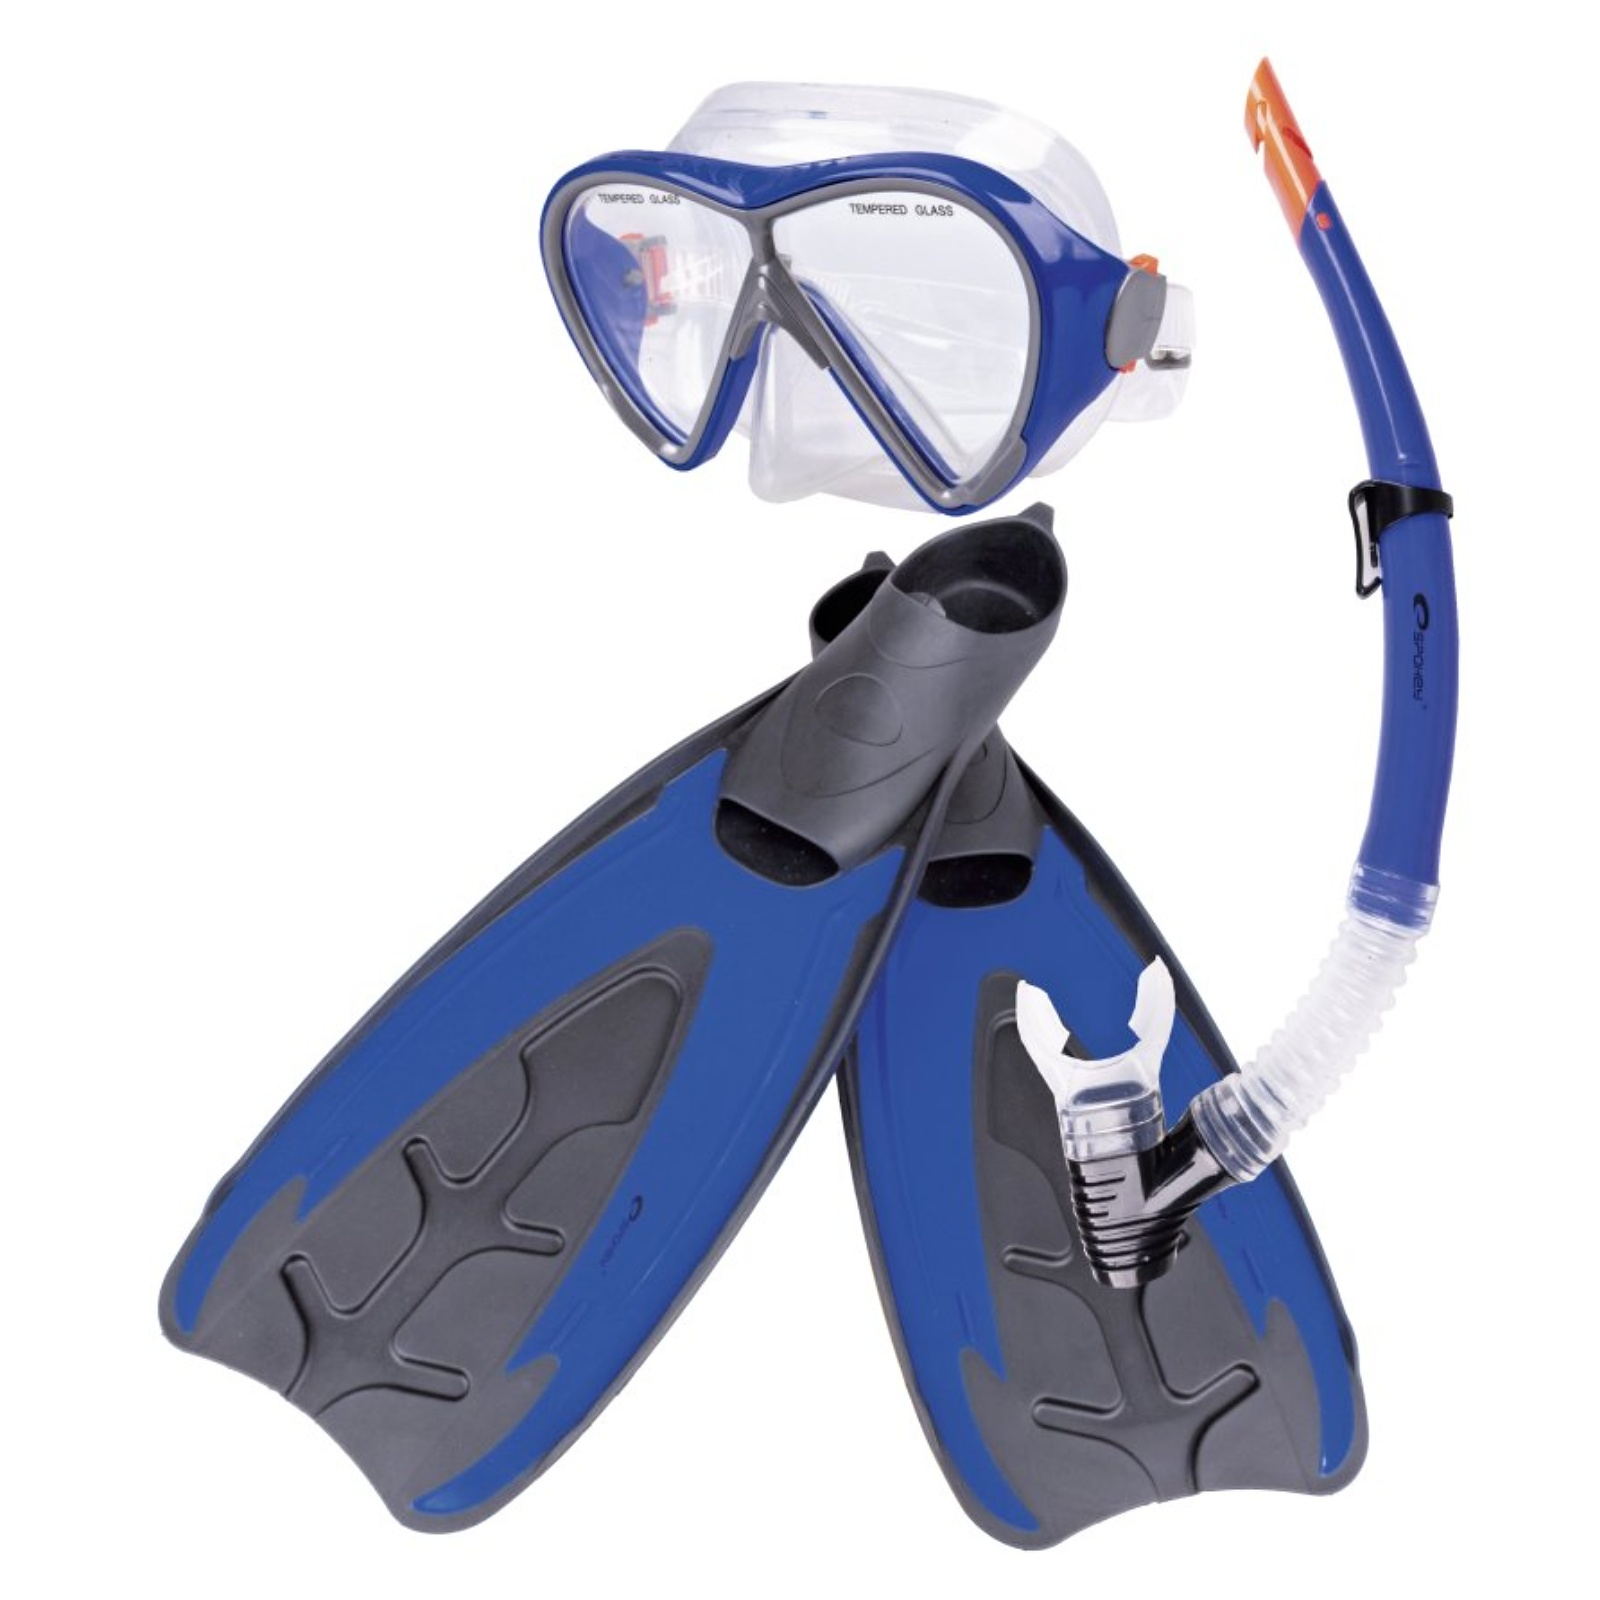 Potápěčský set SPOKEY Merquis - S 38-39